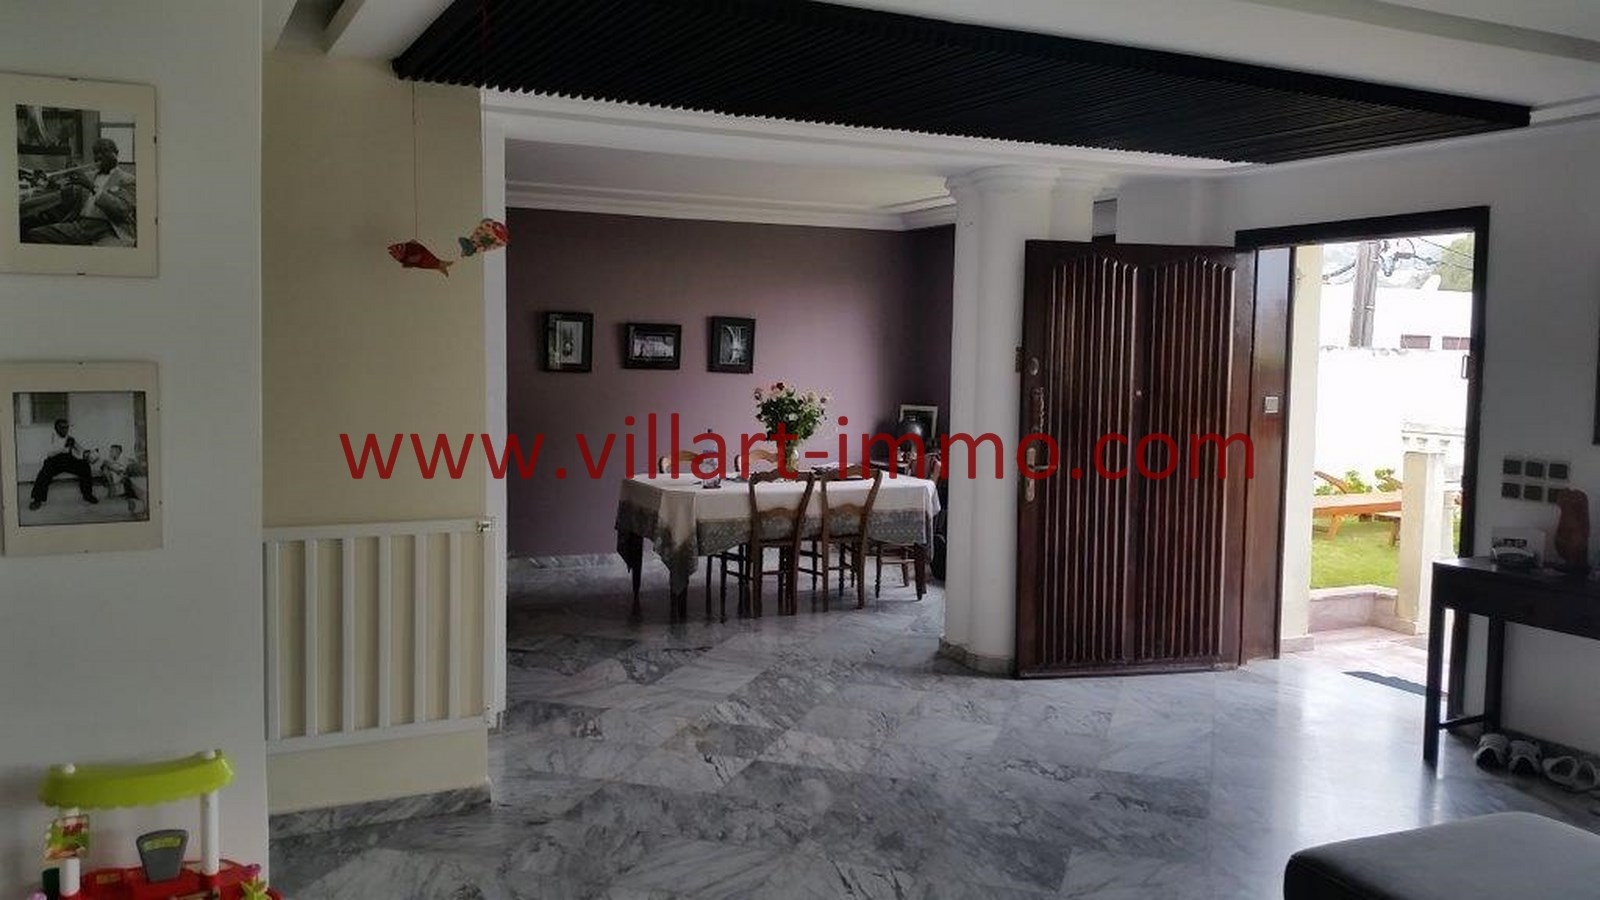 5-a-vendre-tanger-villa-californie-salle-a-manger-vv459-villart-immo-agence-immobiliere